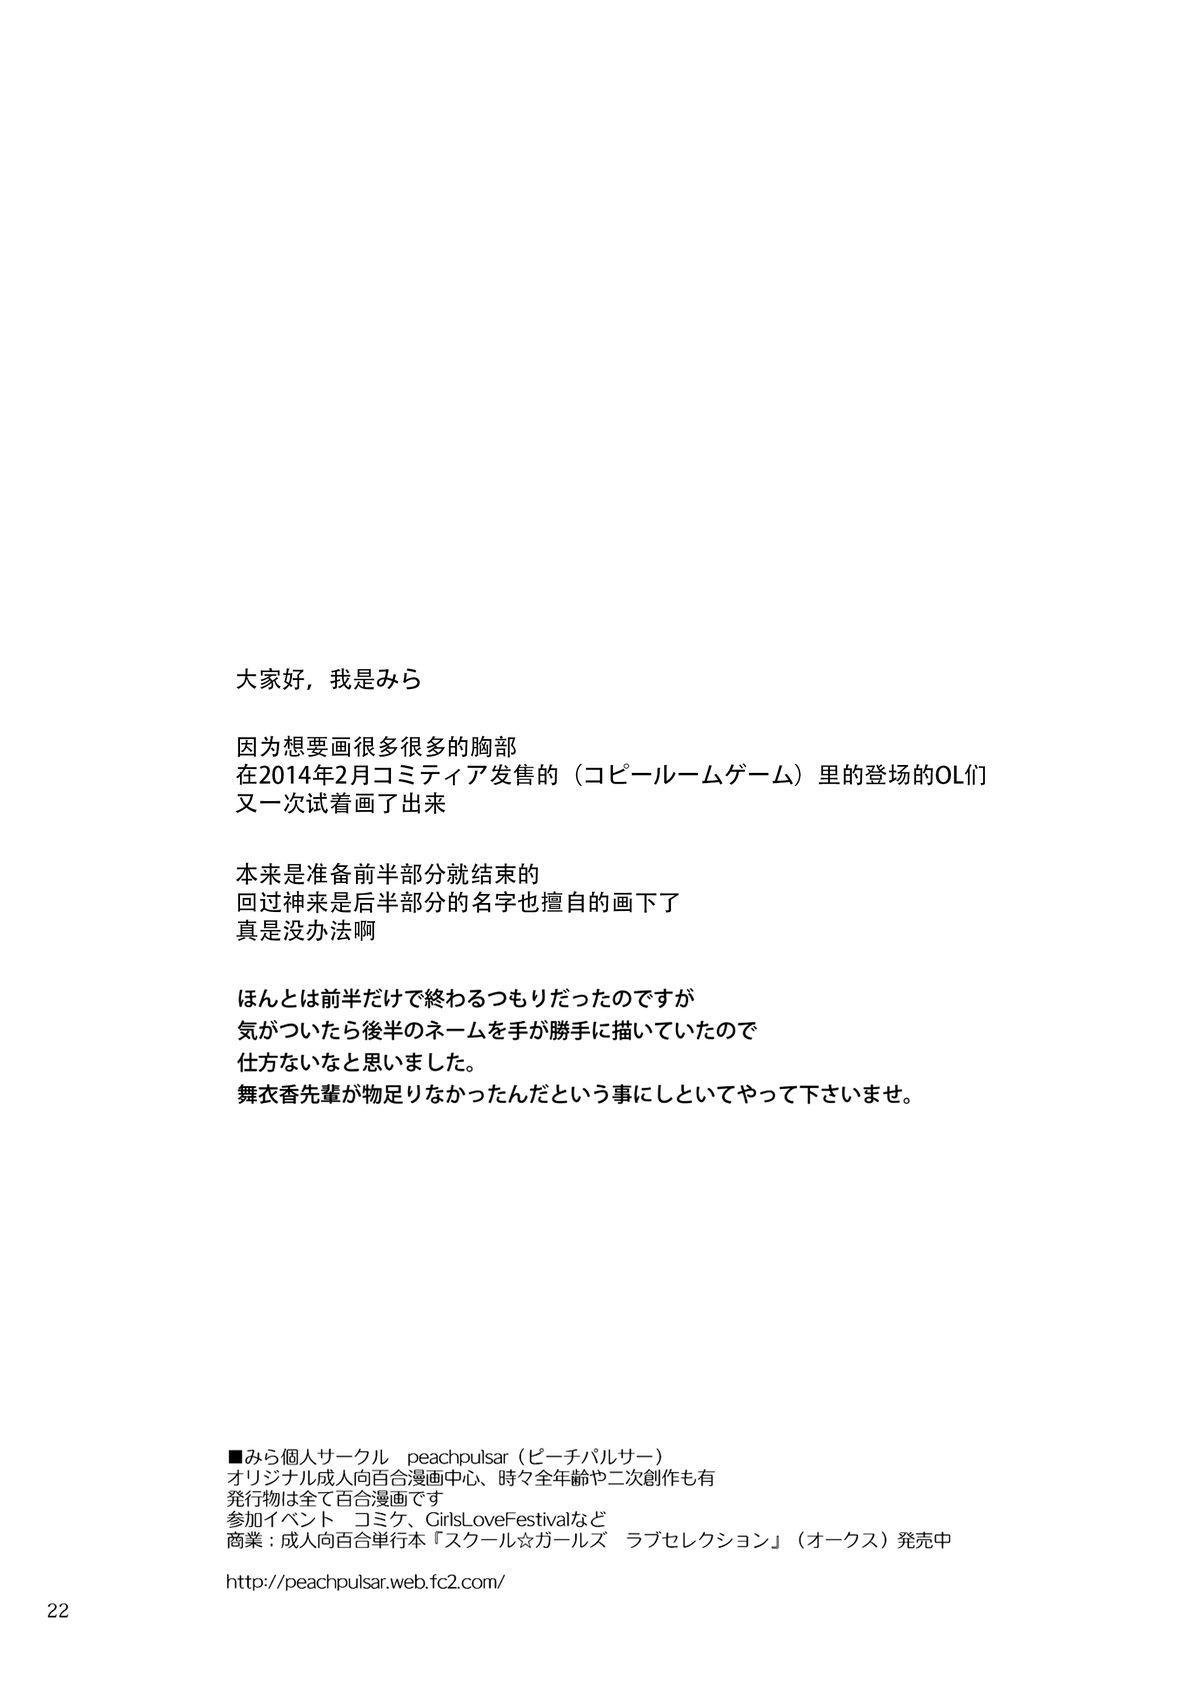 OL-san ga Oppai dake de Icchau Manga 22